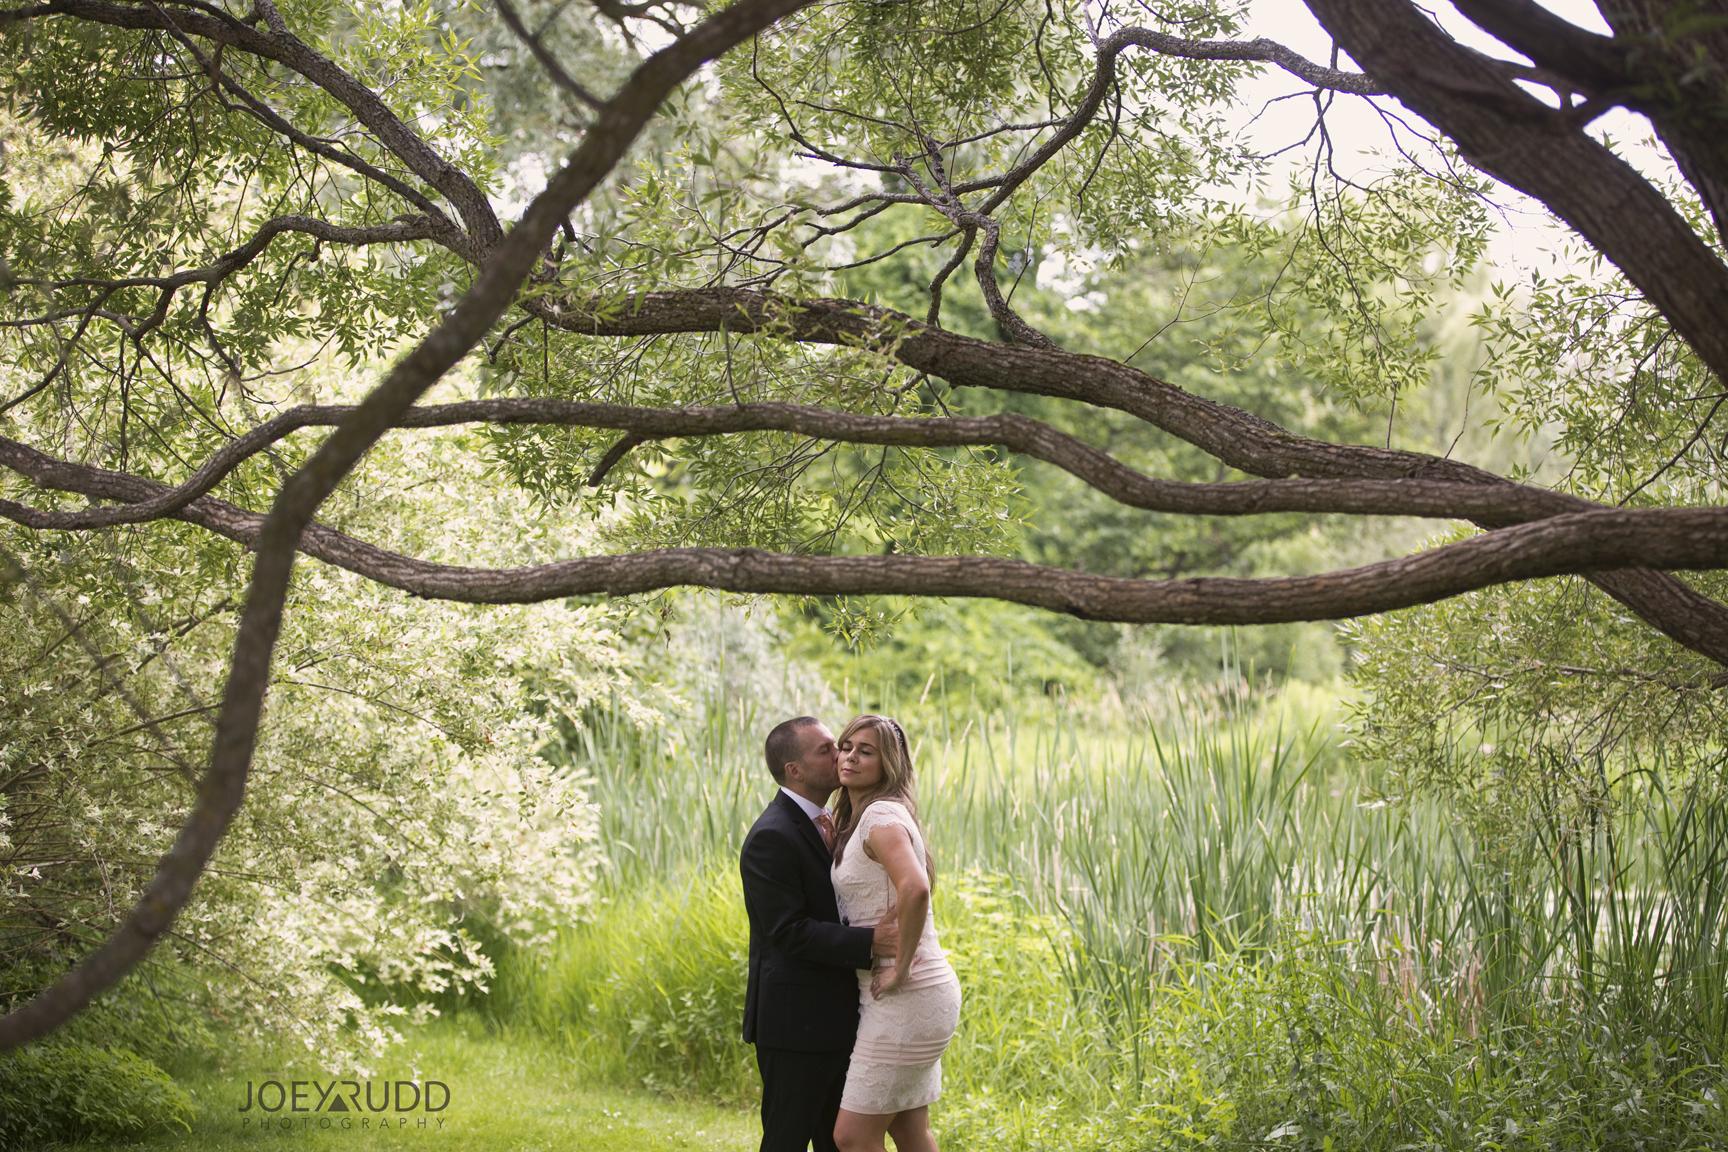 Elopement Wedding by Ottawa Wedding Photographer Joey Rudd Photography Arboretum Trees Hug